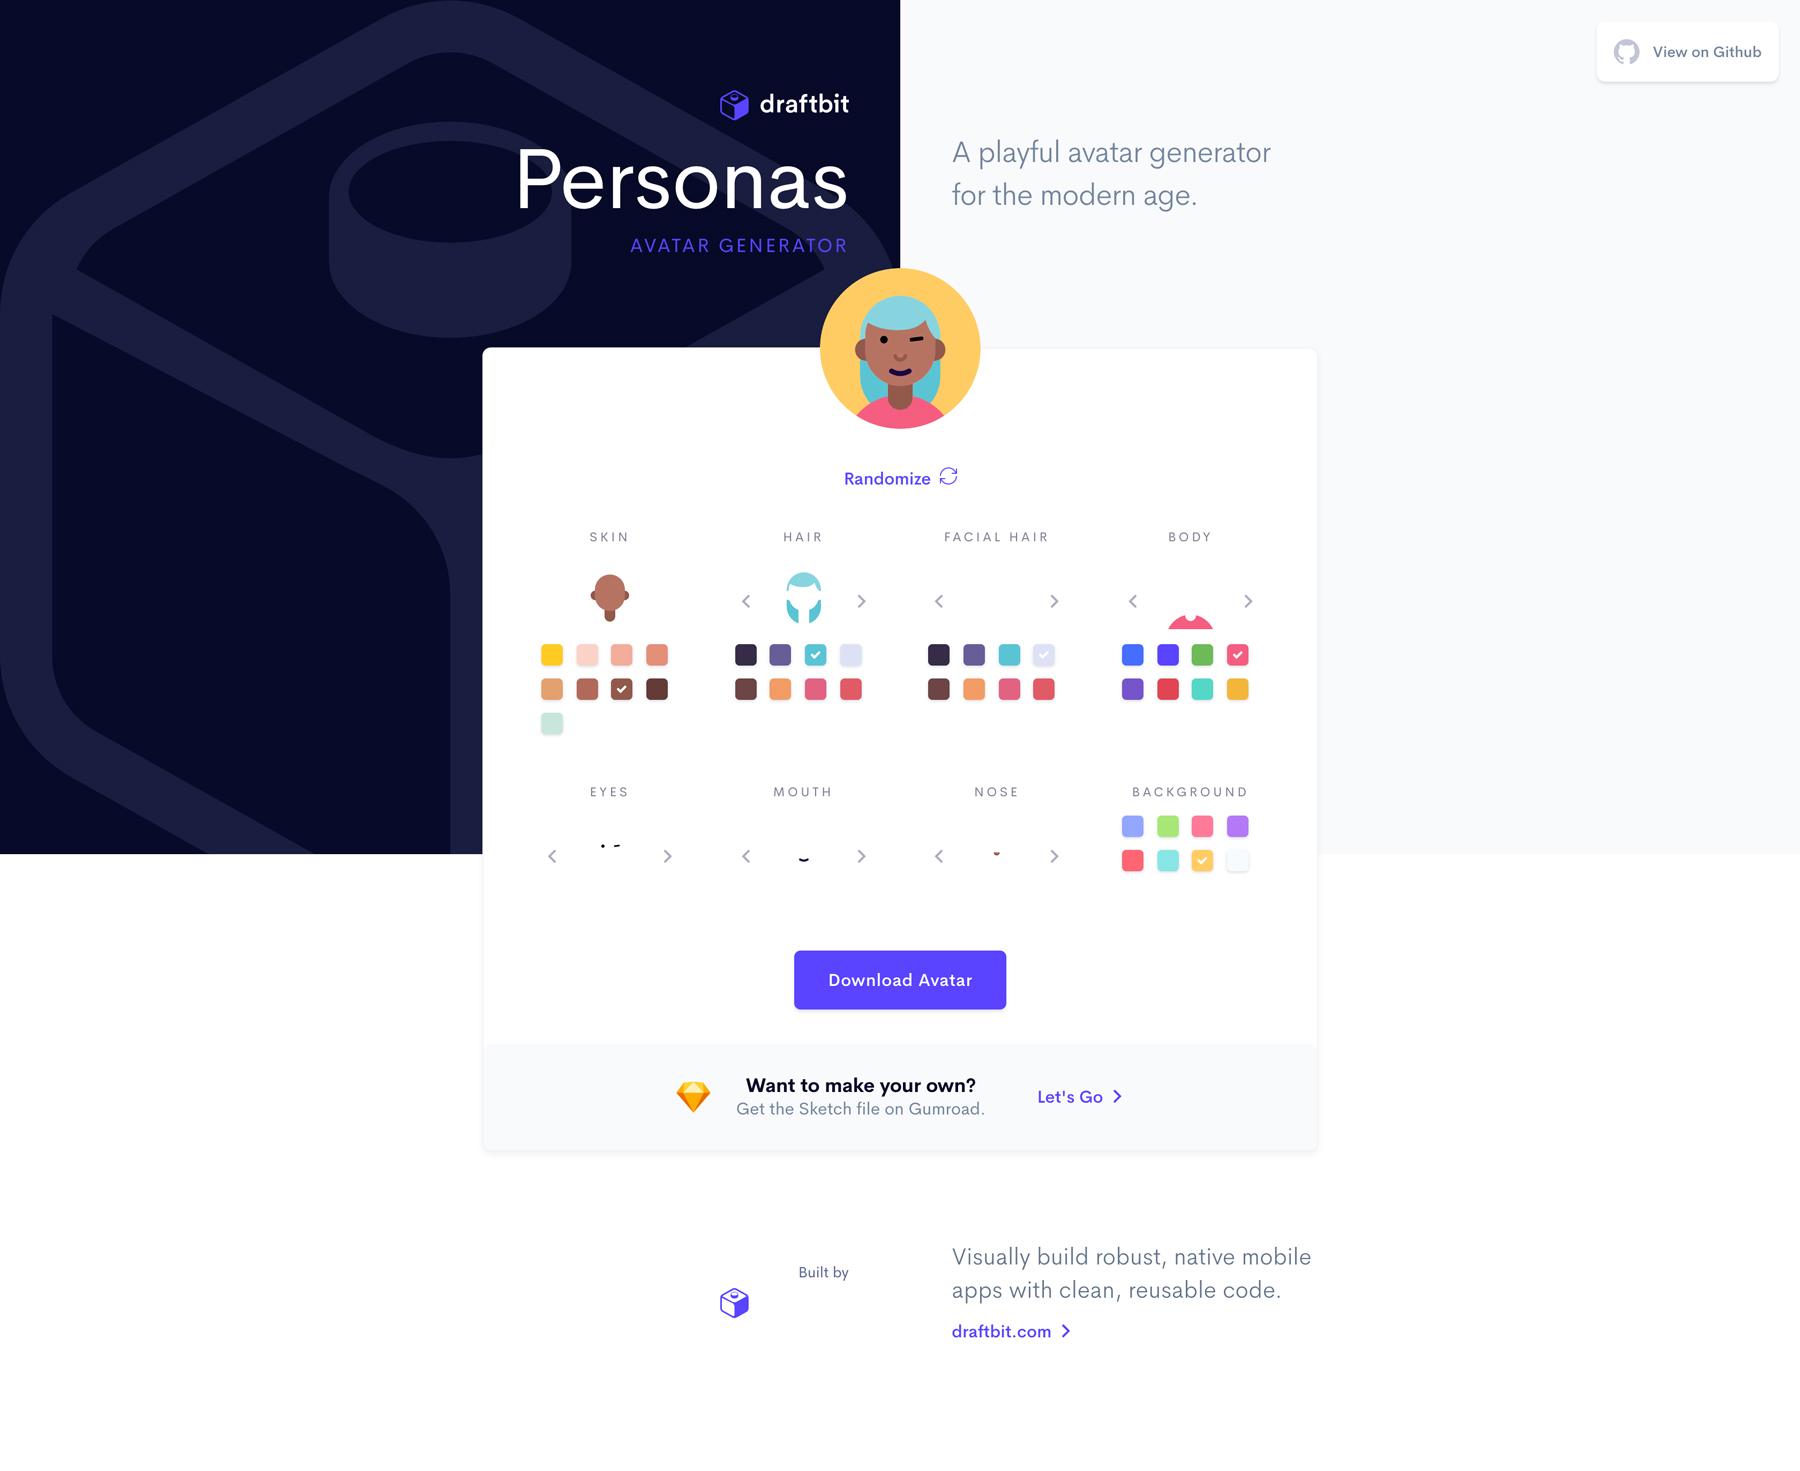 Personas Screenshot